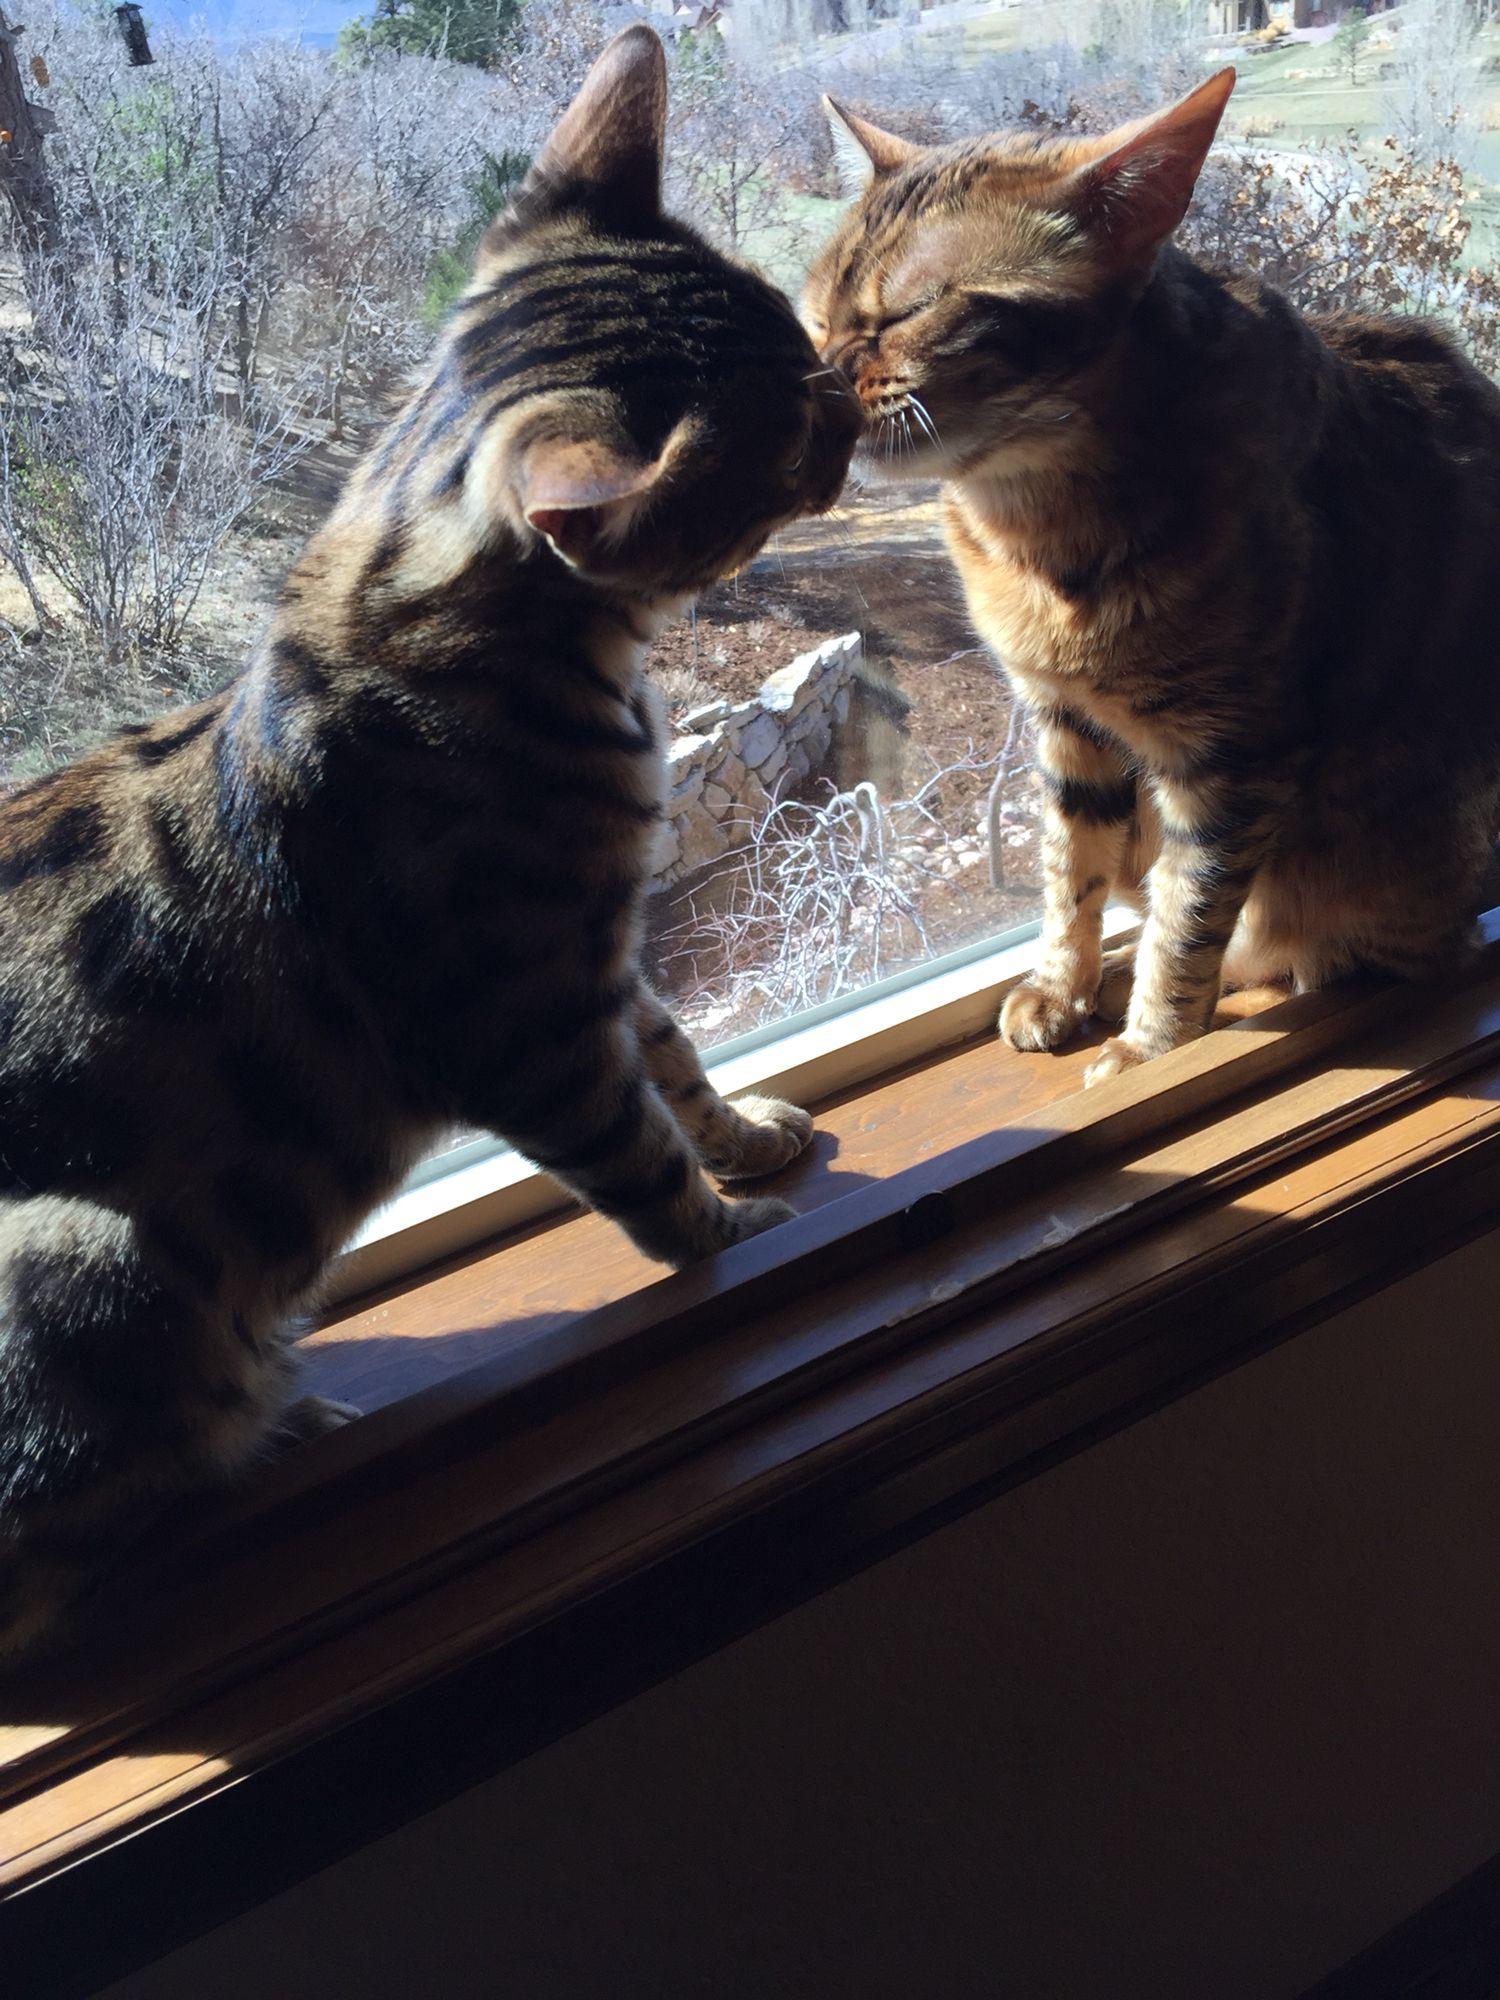 Princess Luna and Nova having a kiss!! So sweet